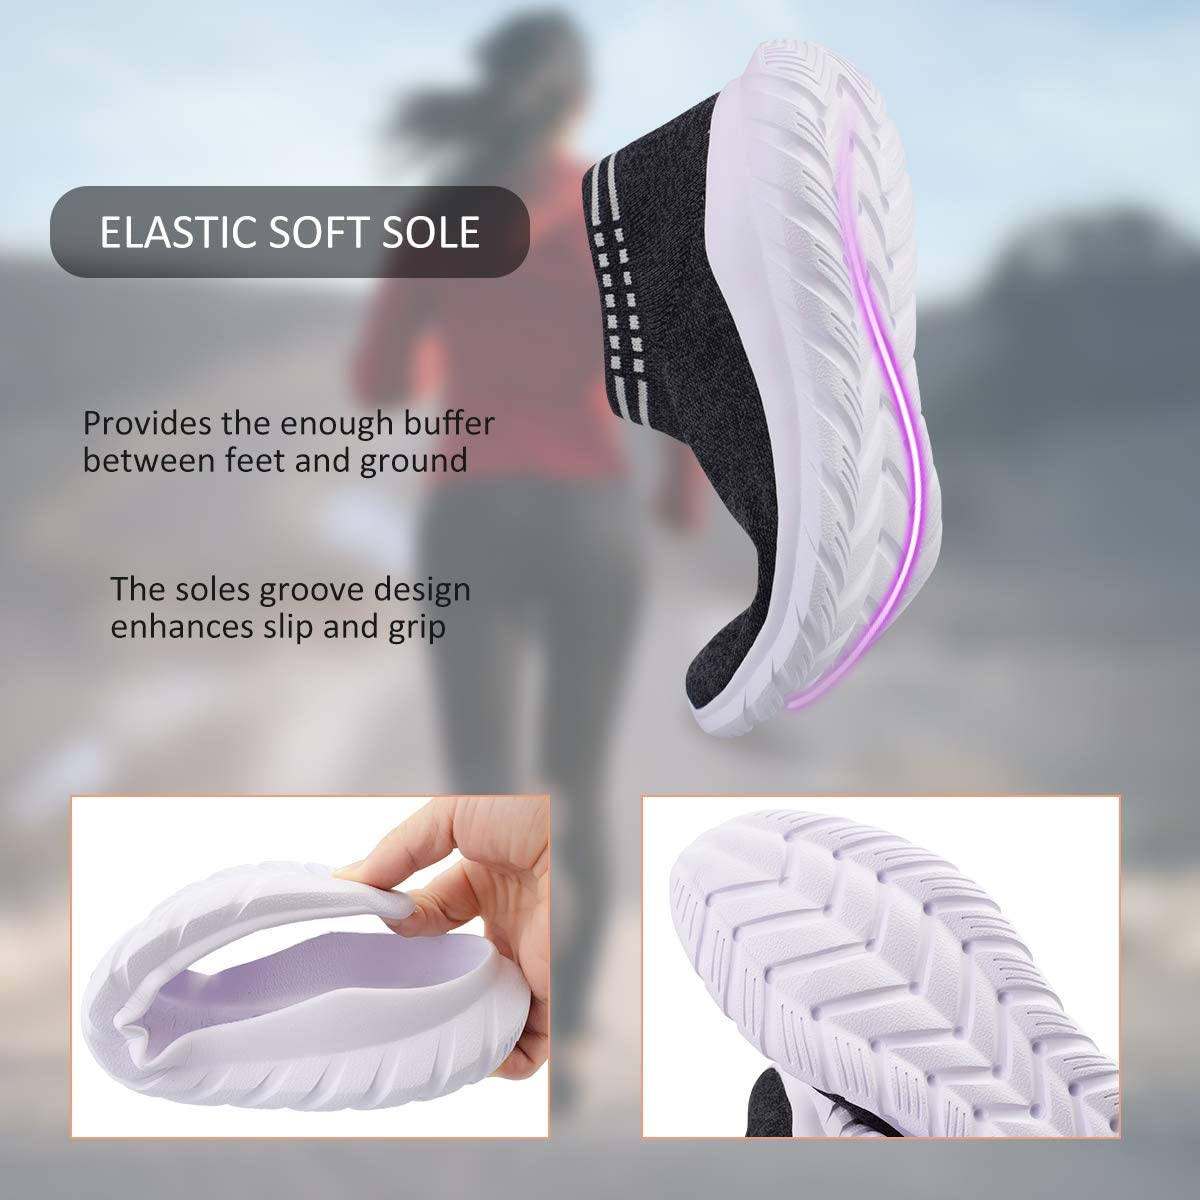 La Dearchuu Walking Shoes Women Slip On Sock Sneakers Mesh Running Shoes Casual Lightweight Knit Sock Shoes for Teen Girls Size 5.5-10.5